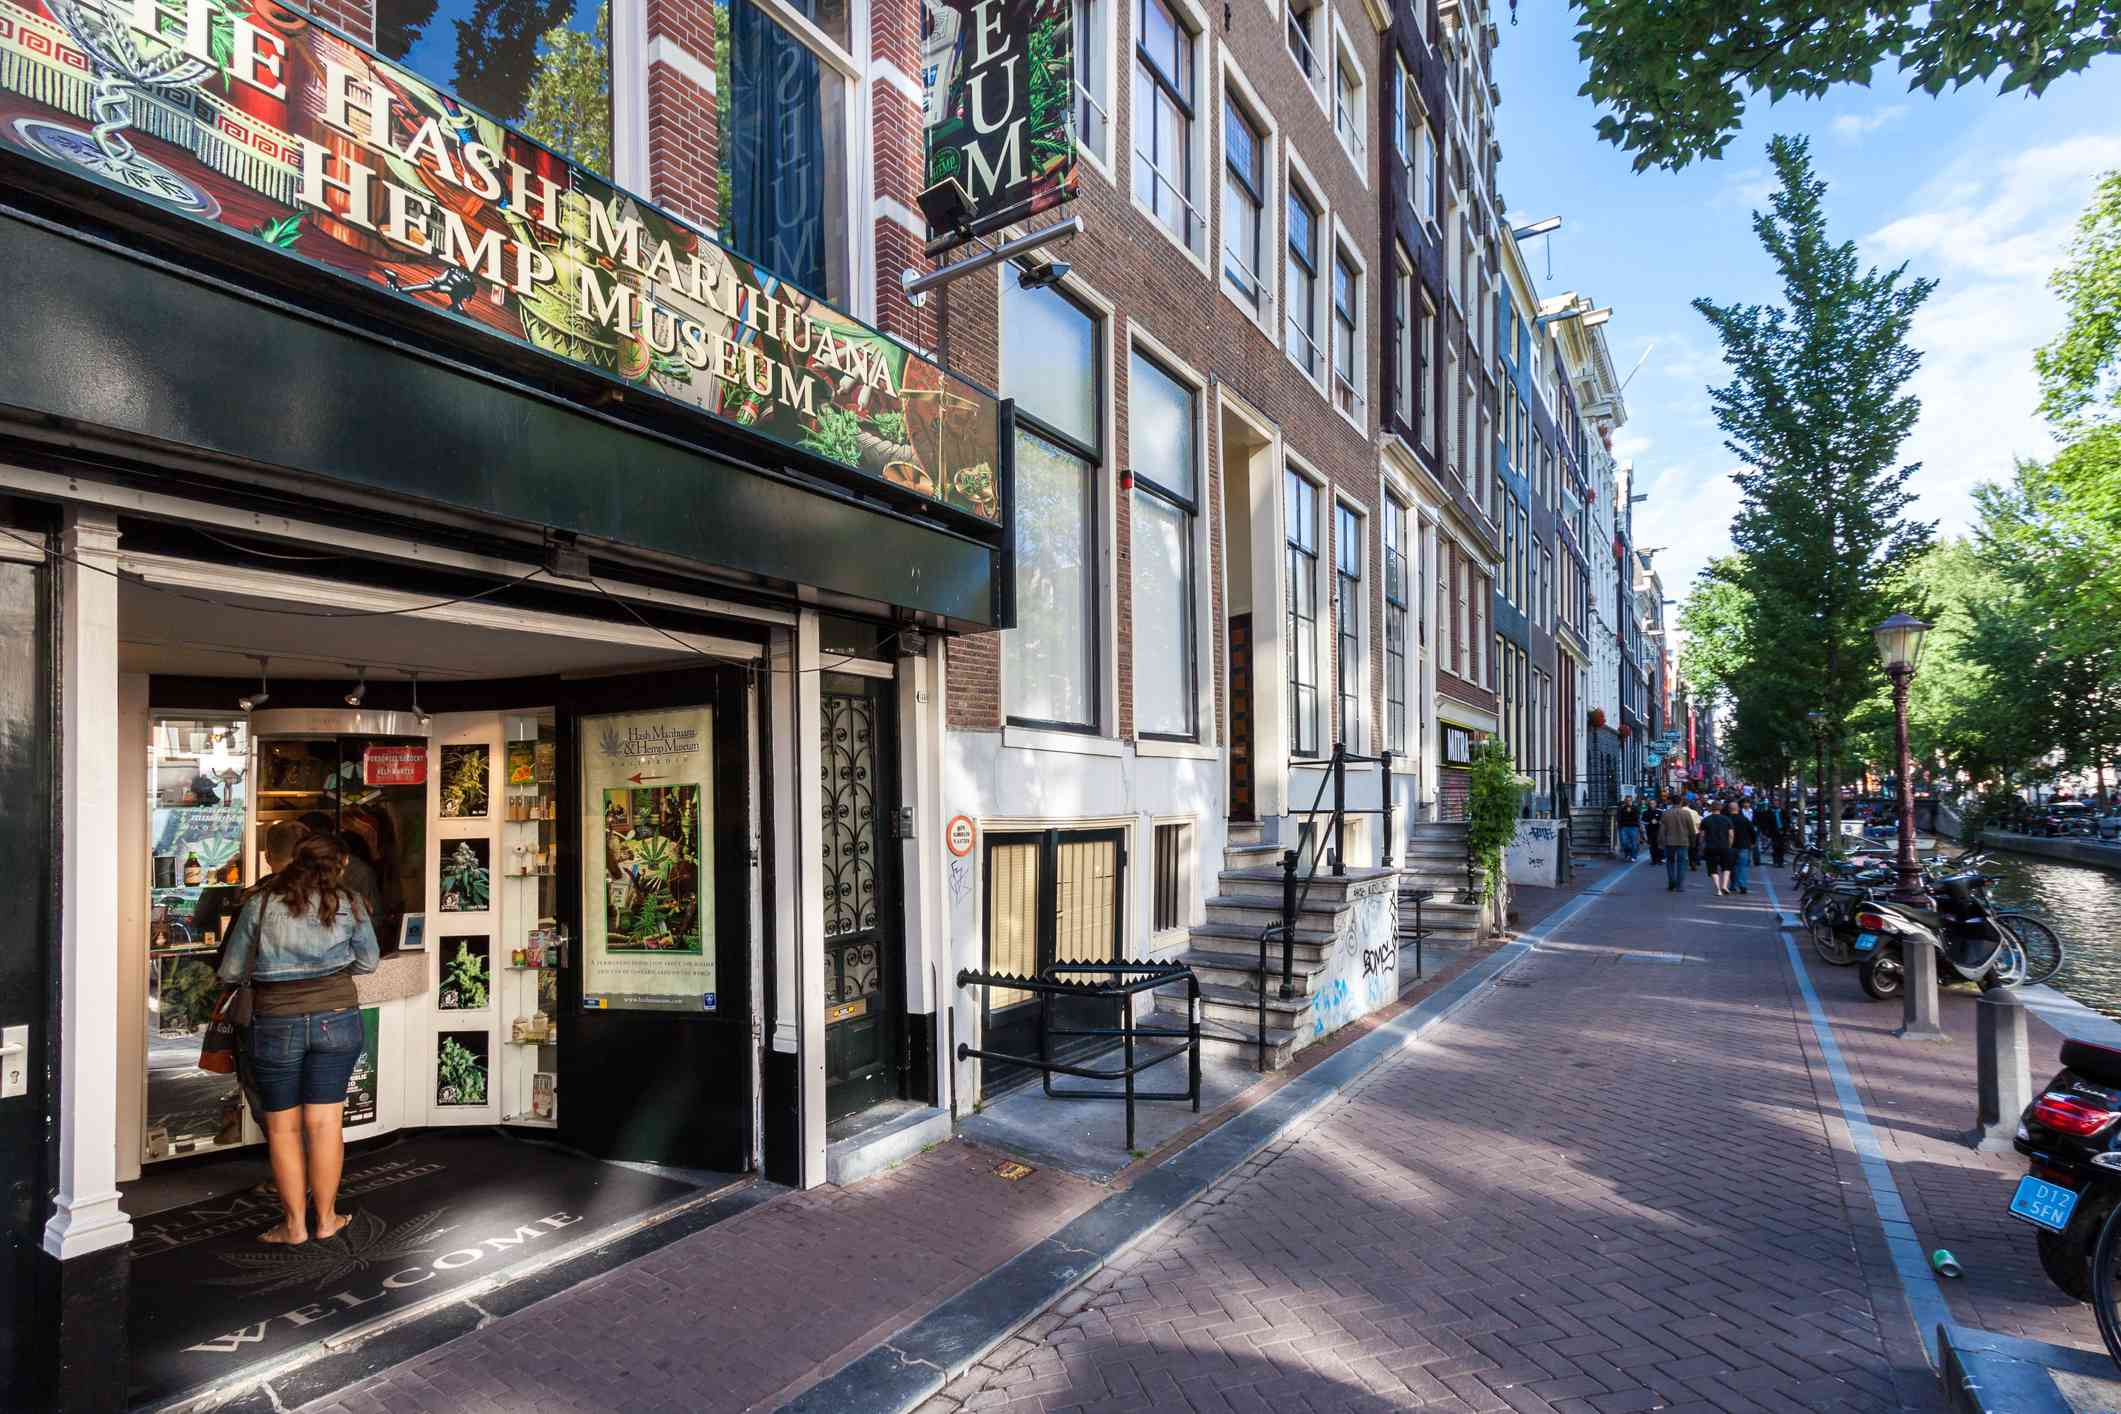 Hash, Marihuana & Hemp Museum in Amsterdam